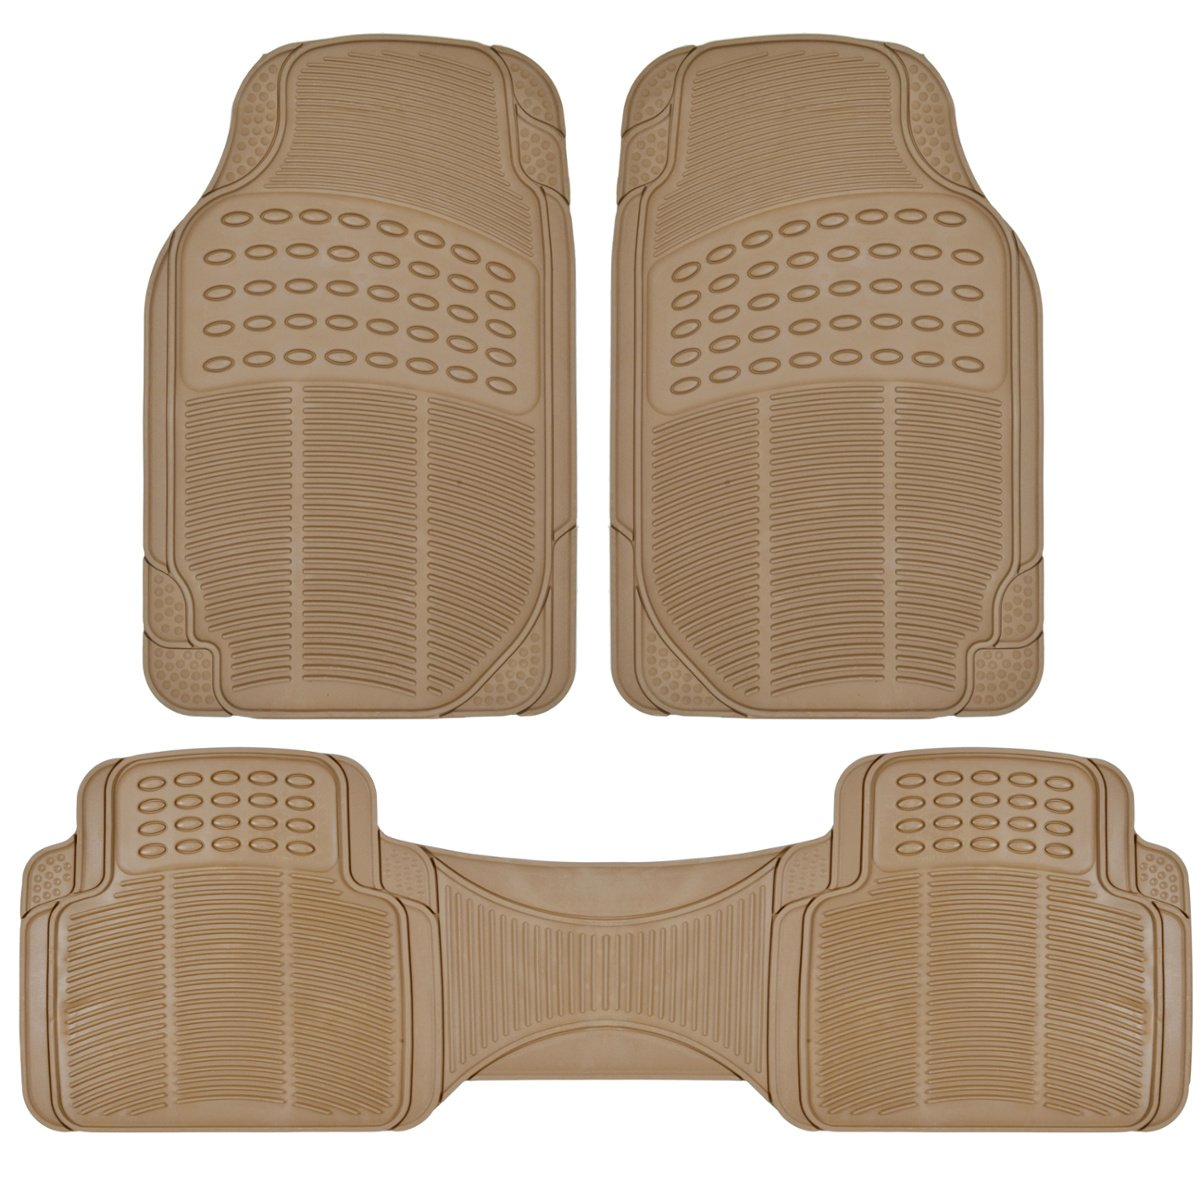 BDK Front and Back ProLiner Heavy Duty Rubber Floor Mats for Auto, 3 Piece Set - Tan Beige